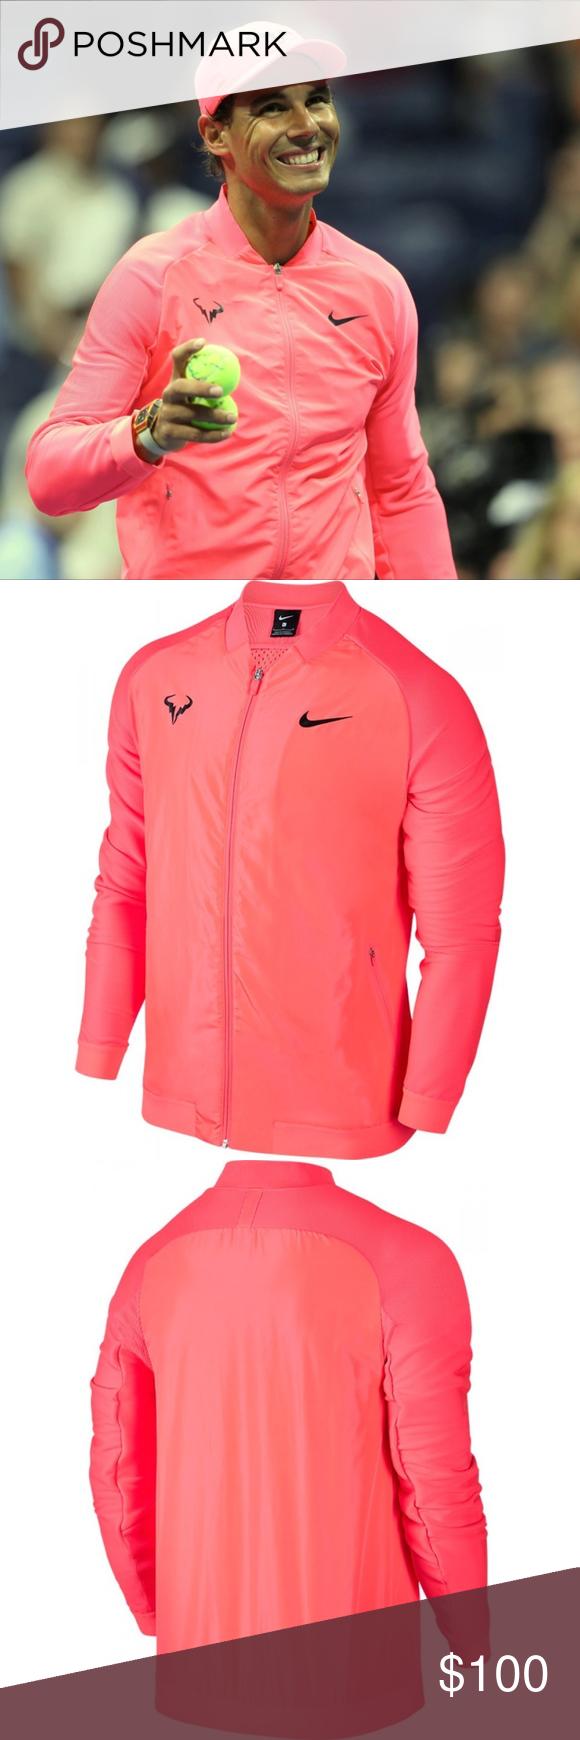 Nike Court Rafa Nadal Tennis Jacket Hot Punch Clothes Design Jackets Fashion